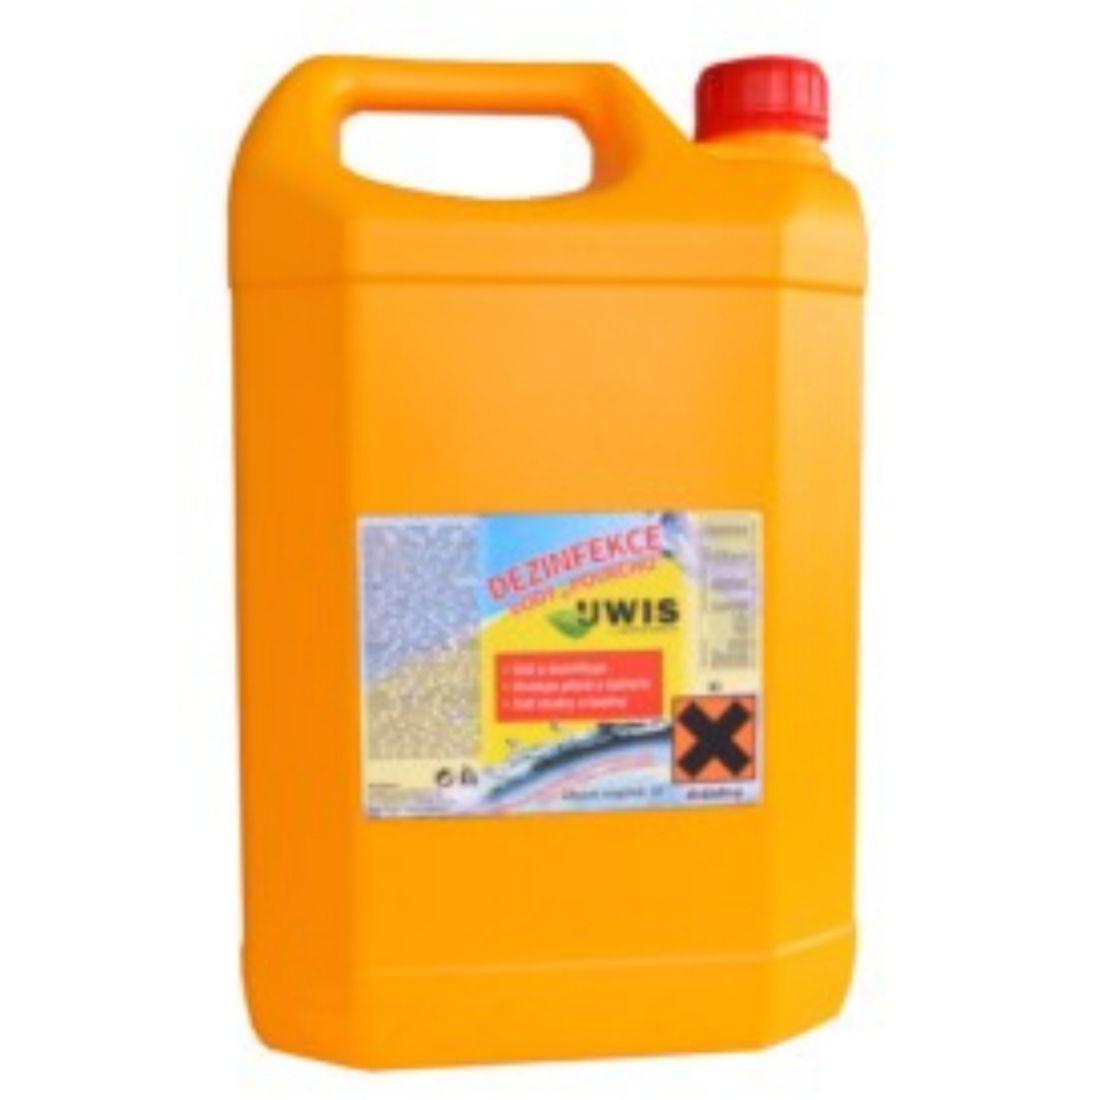 UWIS dezinfekce vody 5 l